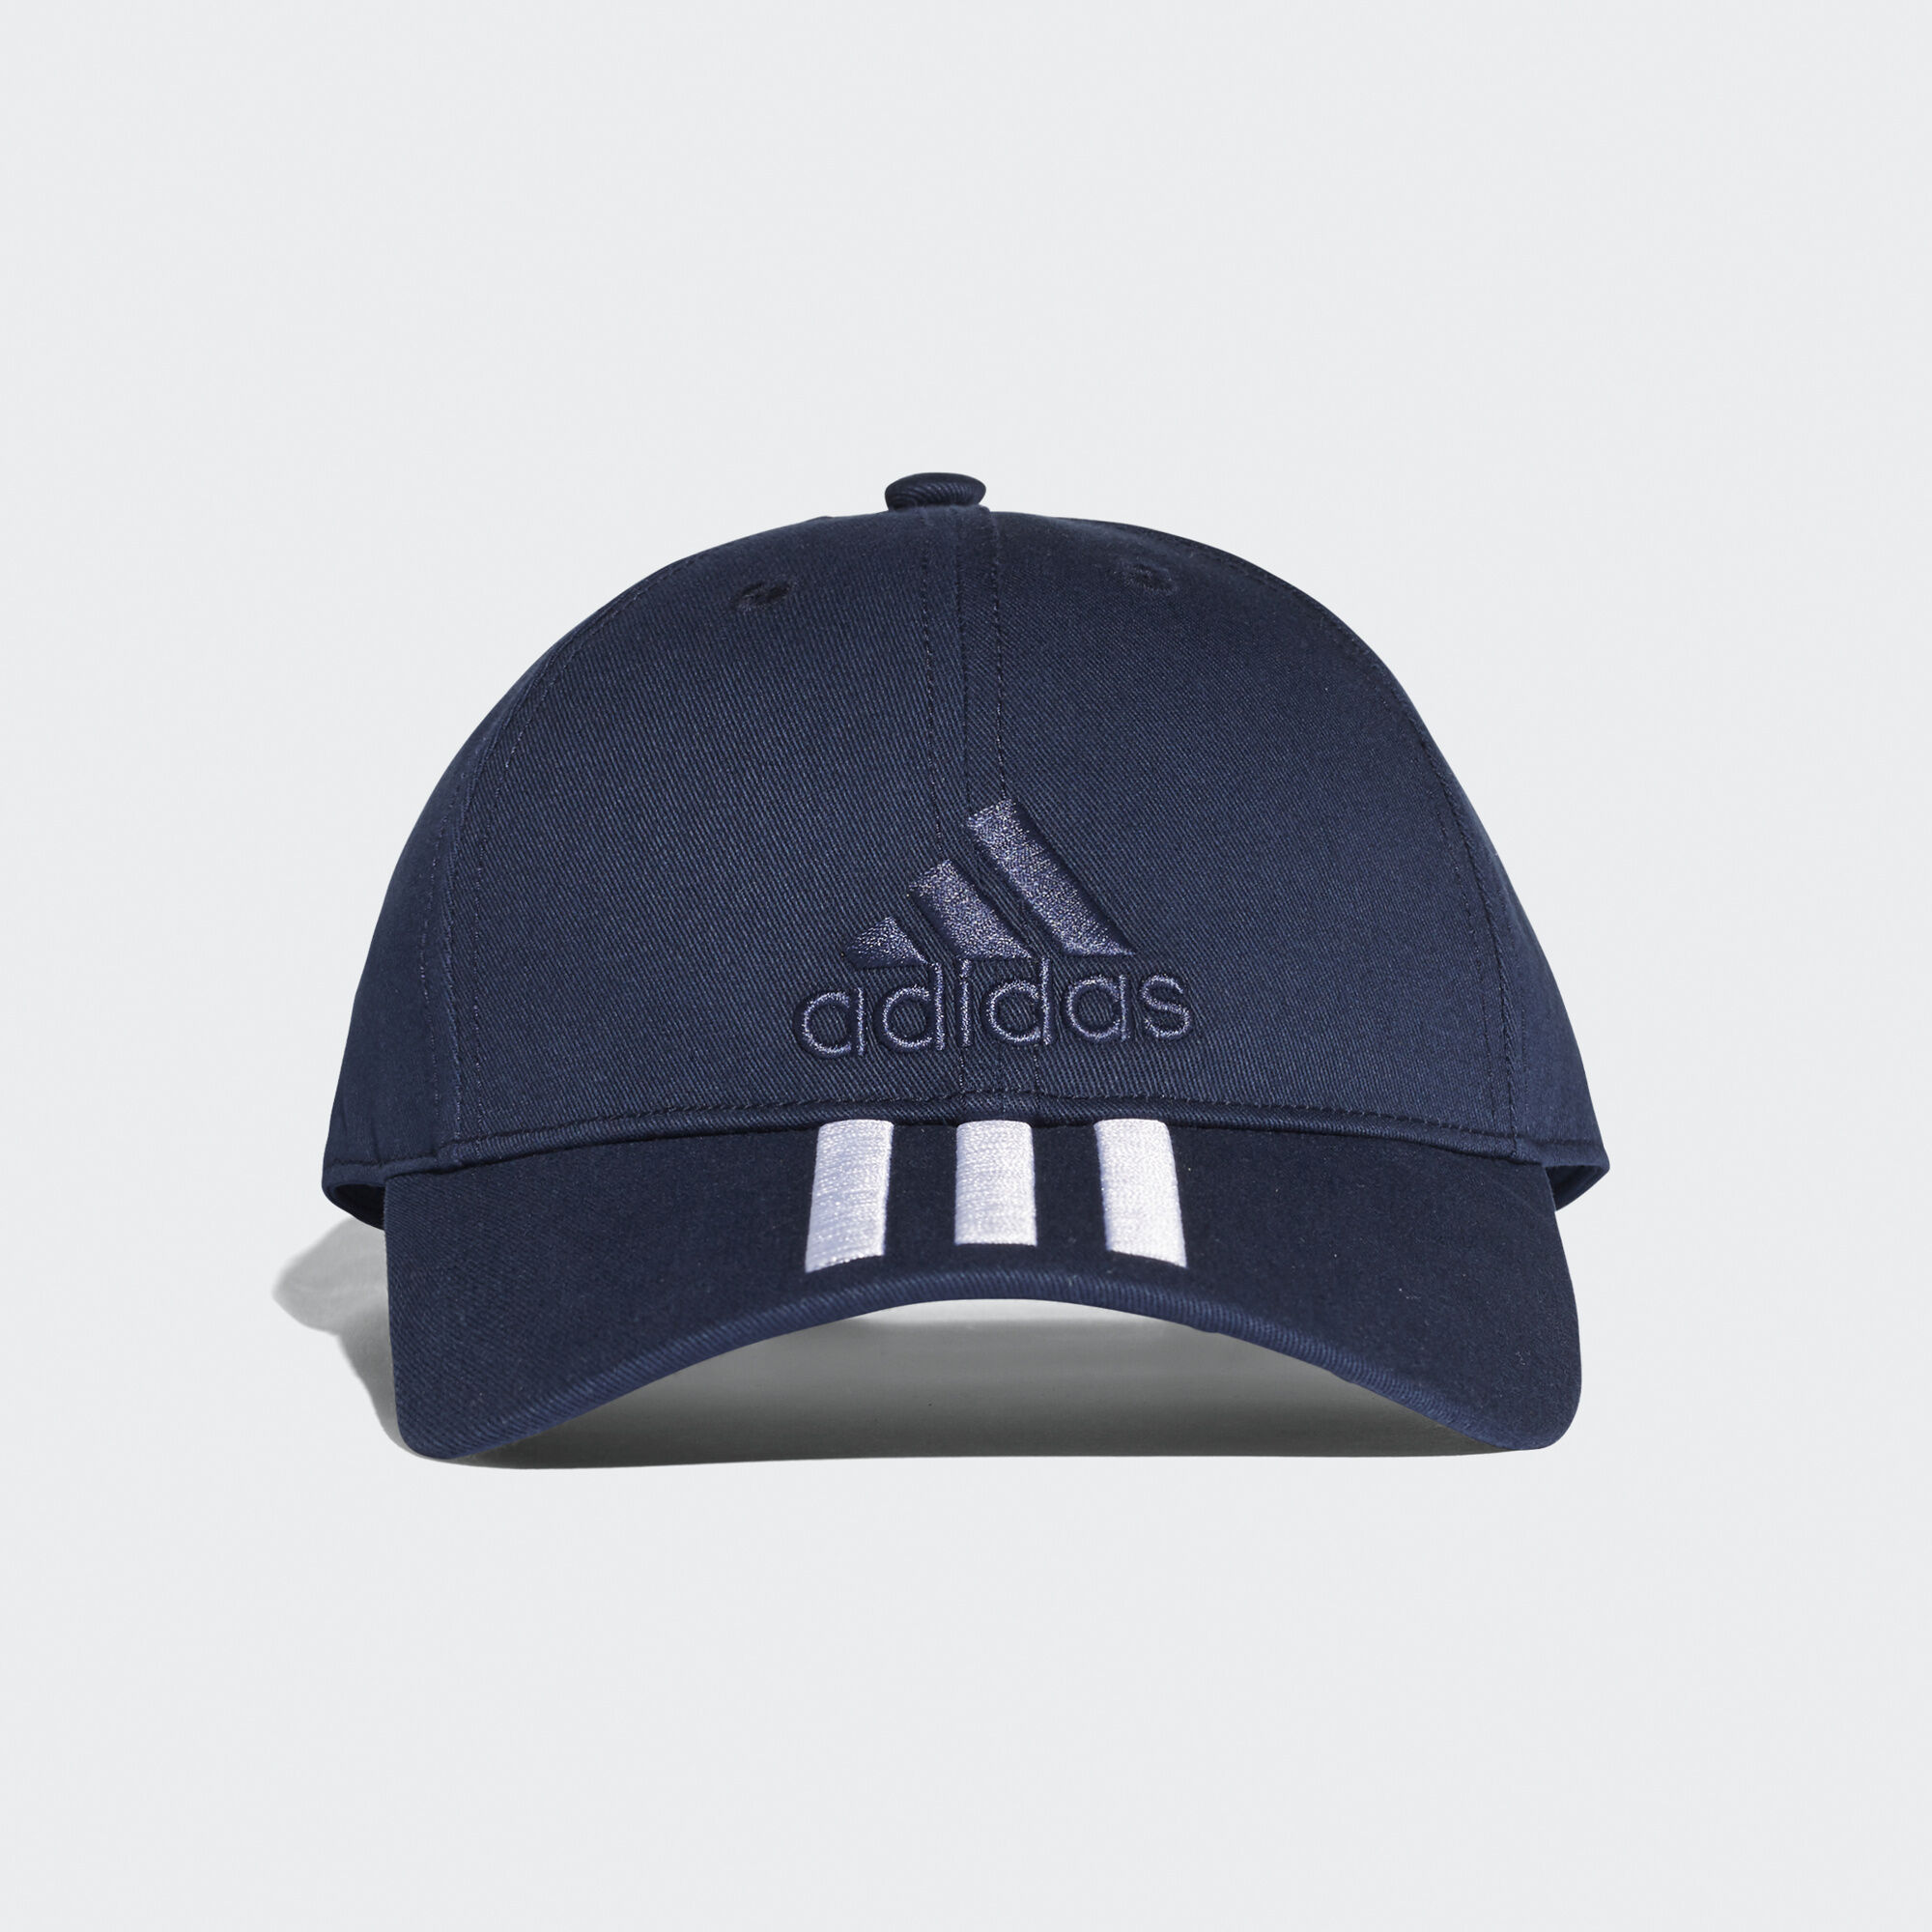 ... where to buy adidas six panel classic 3 stripes cap collegiate navy  white bk0808 54e3f 875e7 931c4e7aff